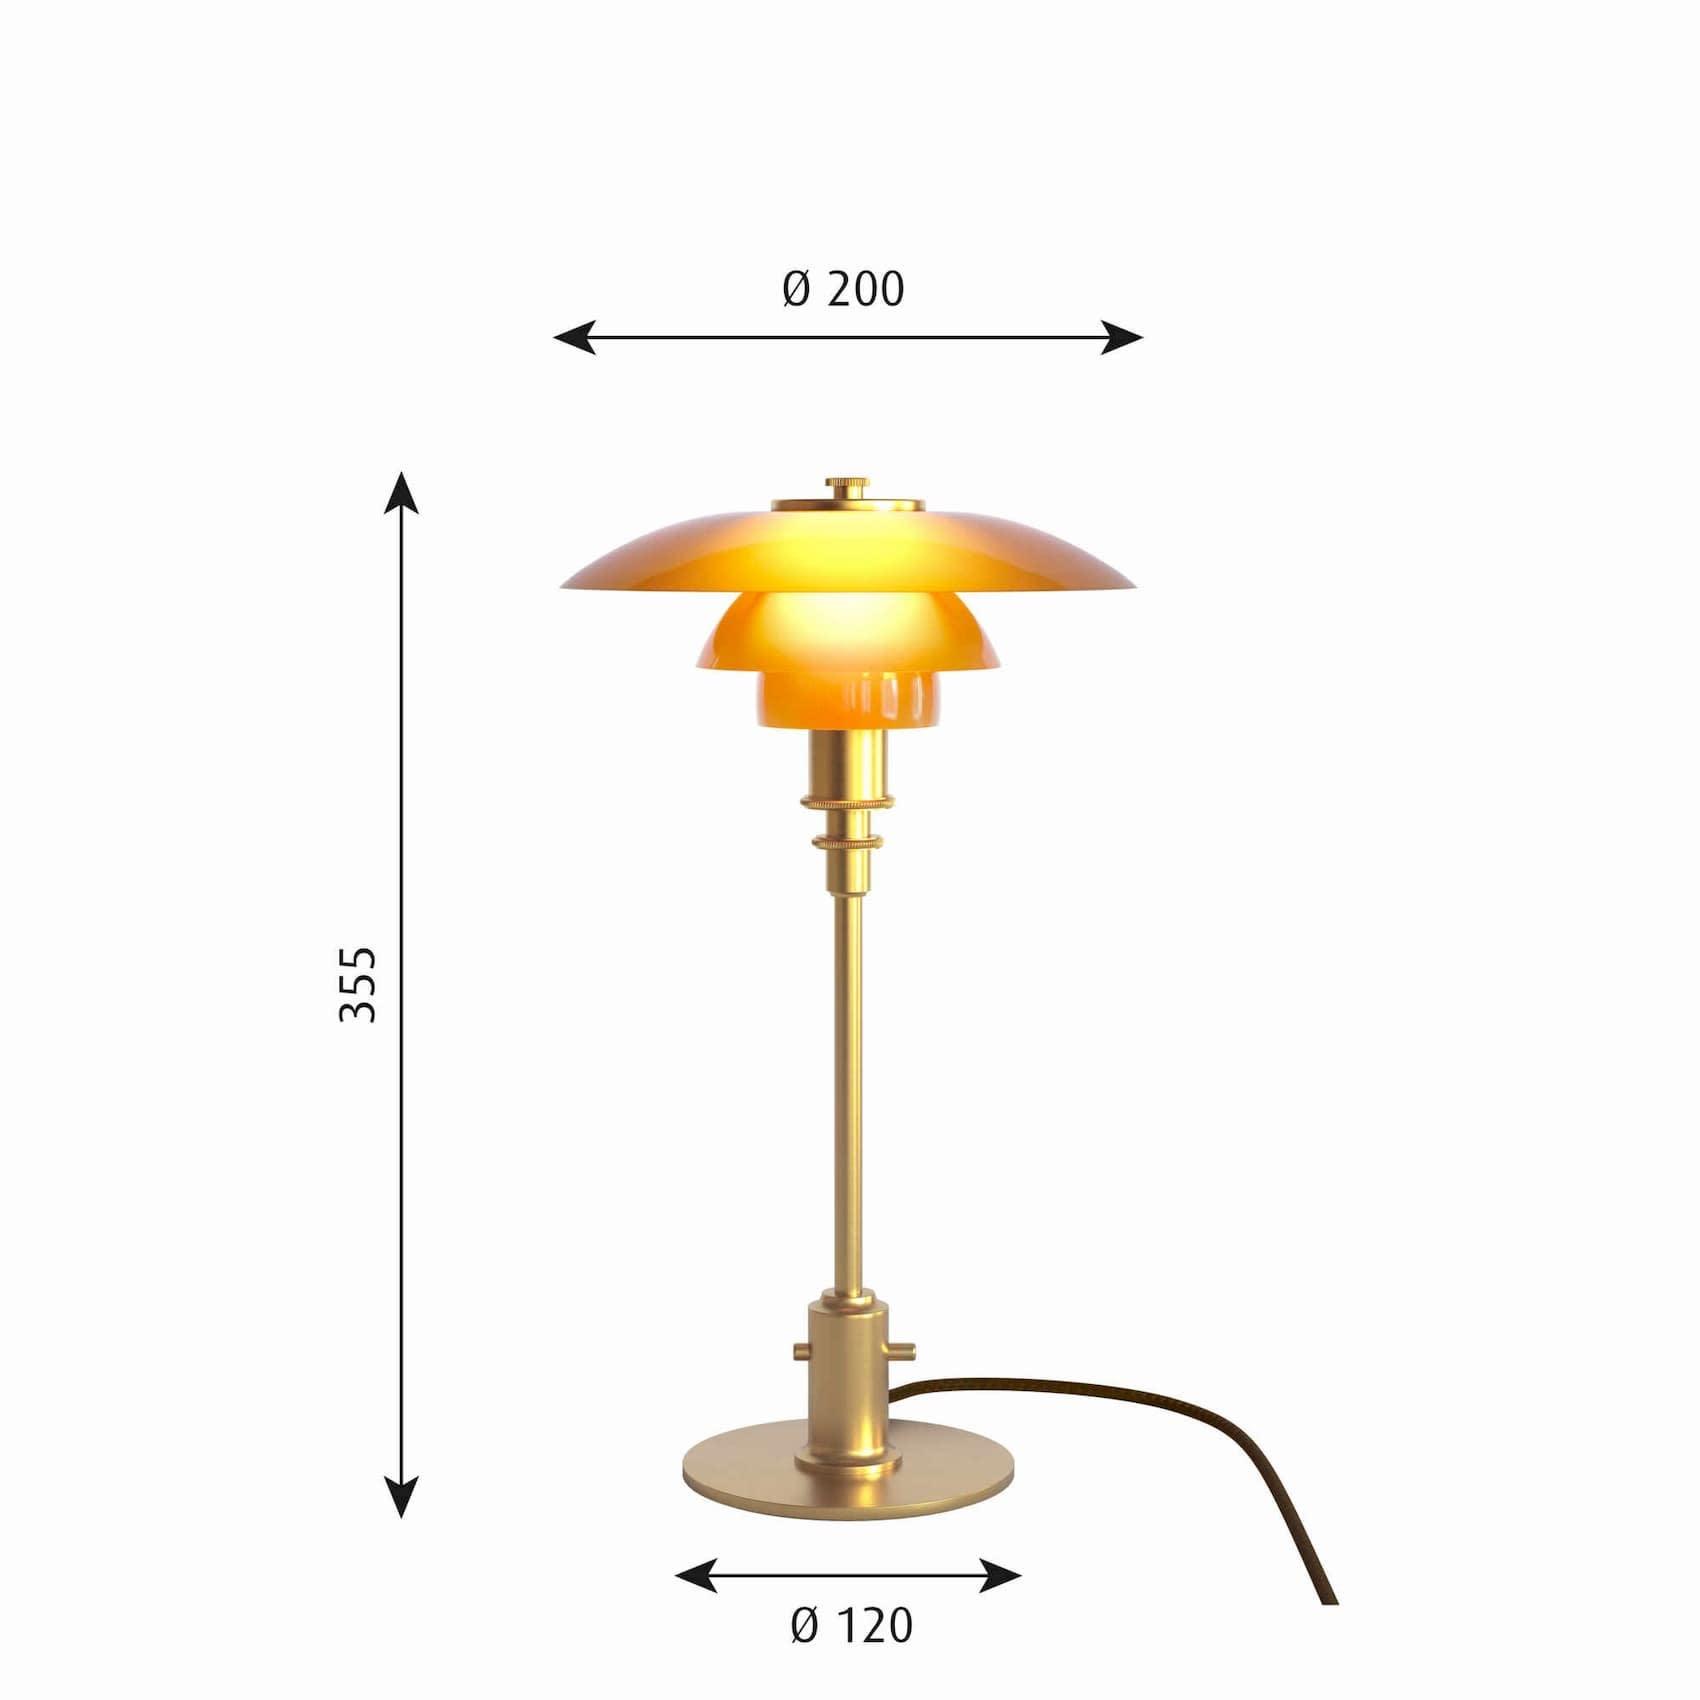 louis-poulsen-ph-2-1-amber-glass-lamp-dimensions